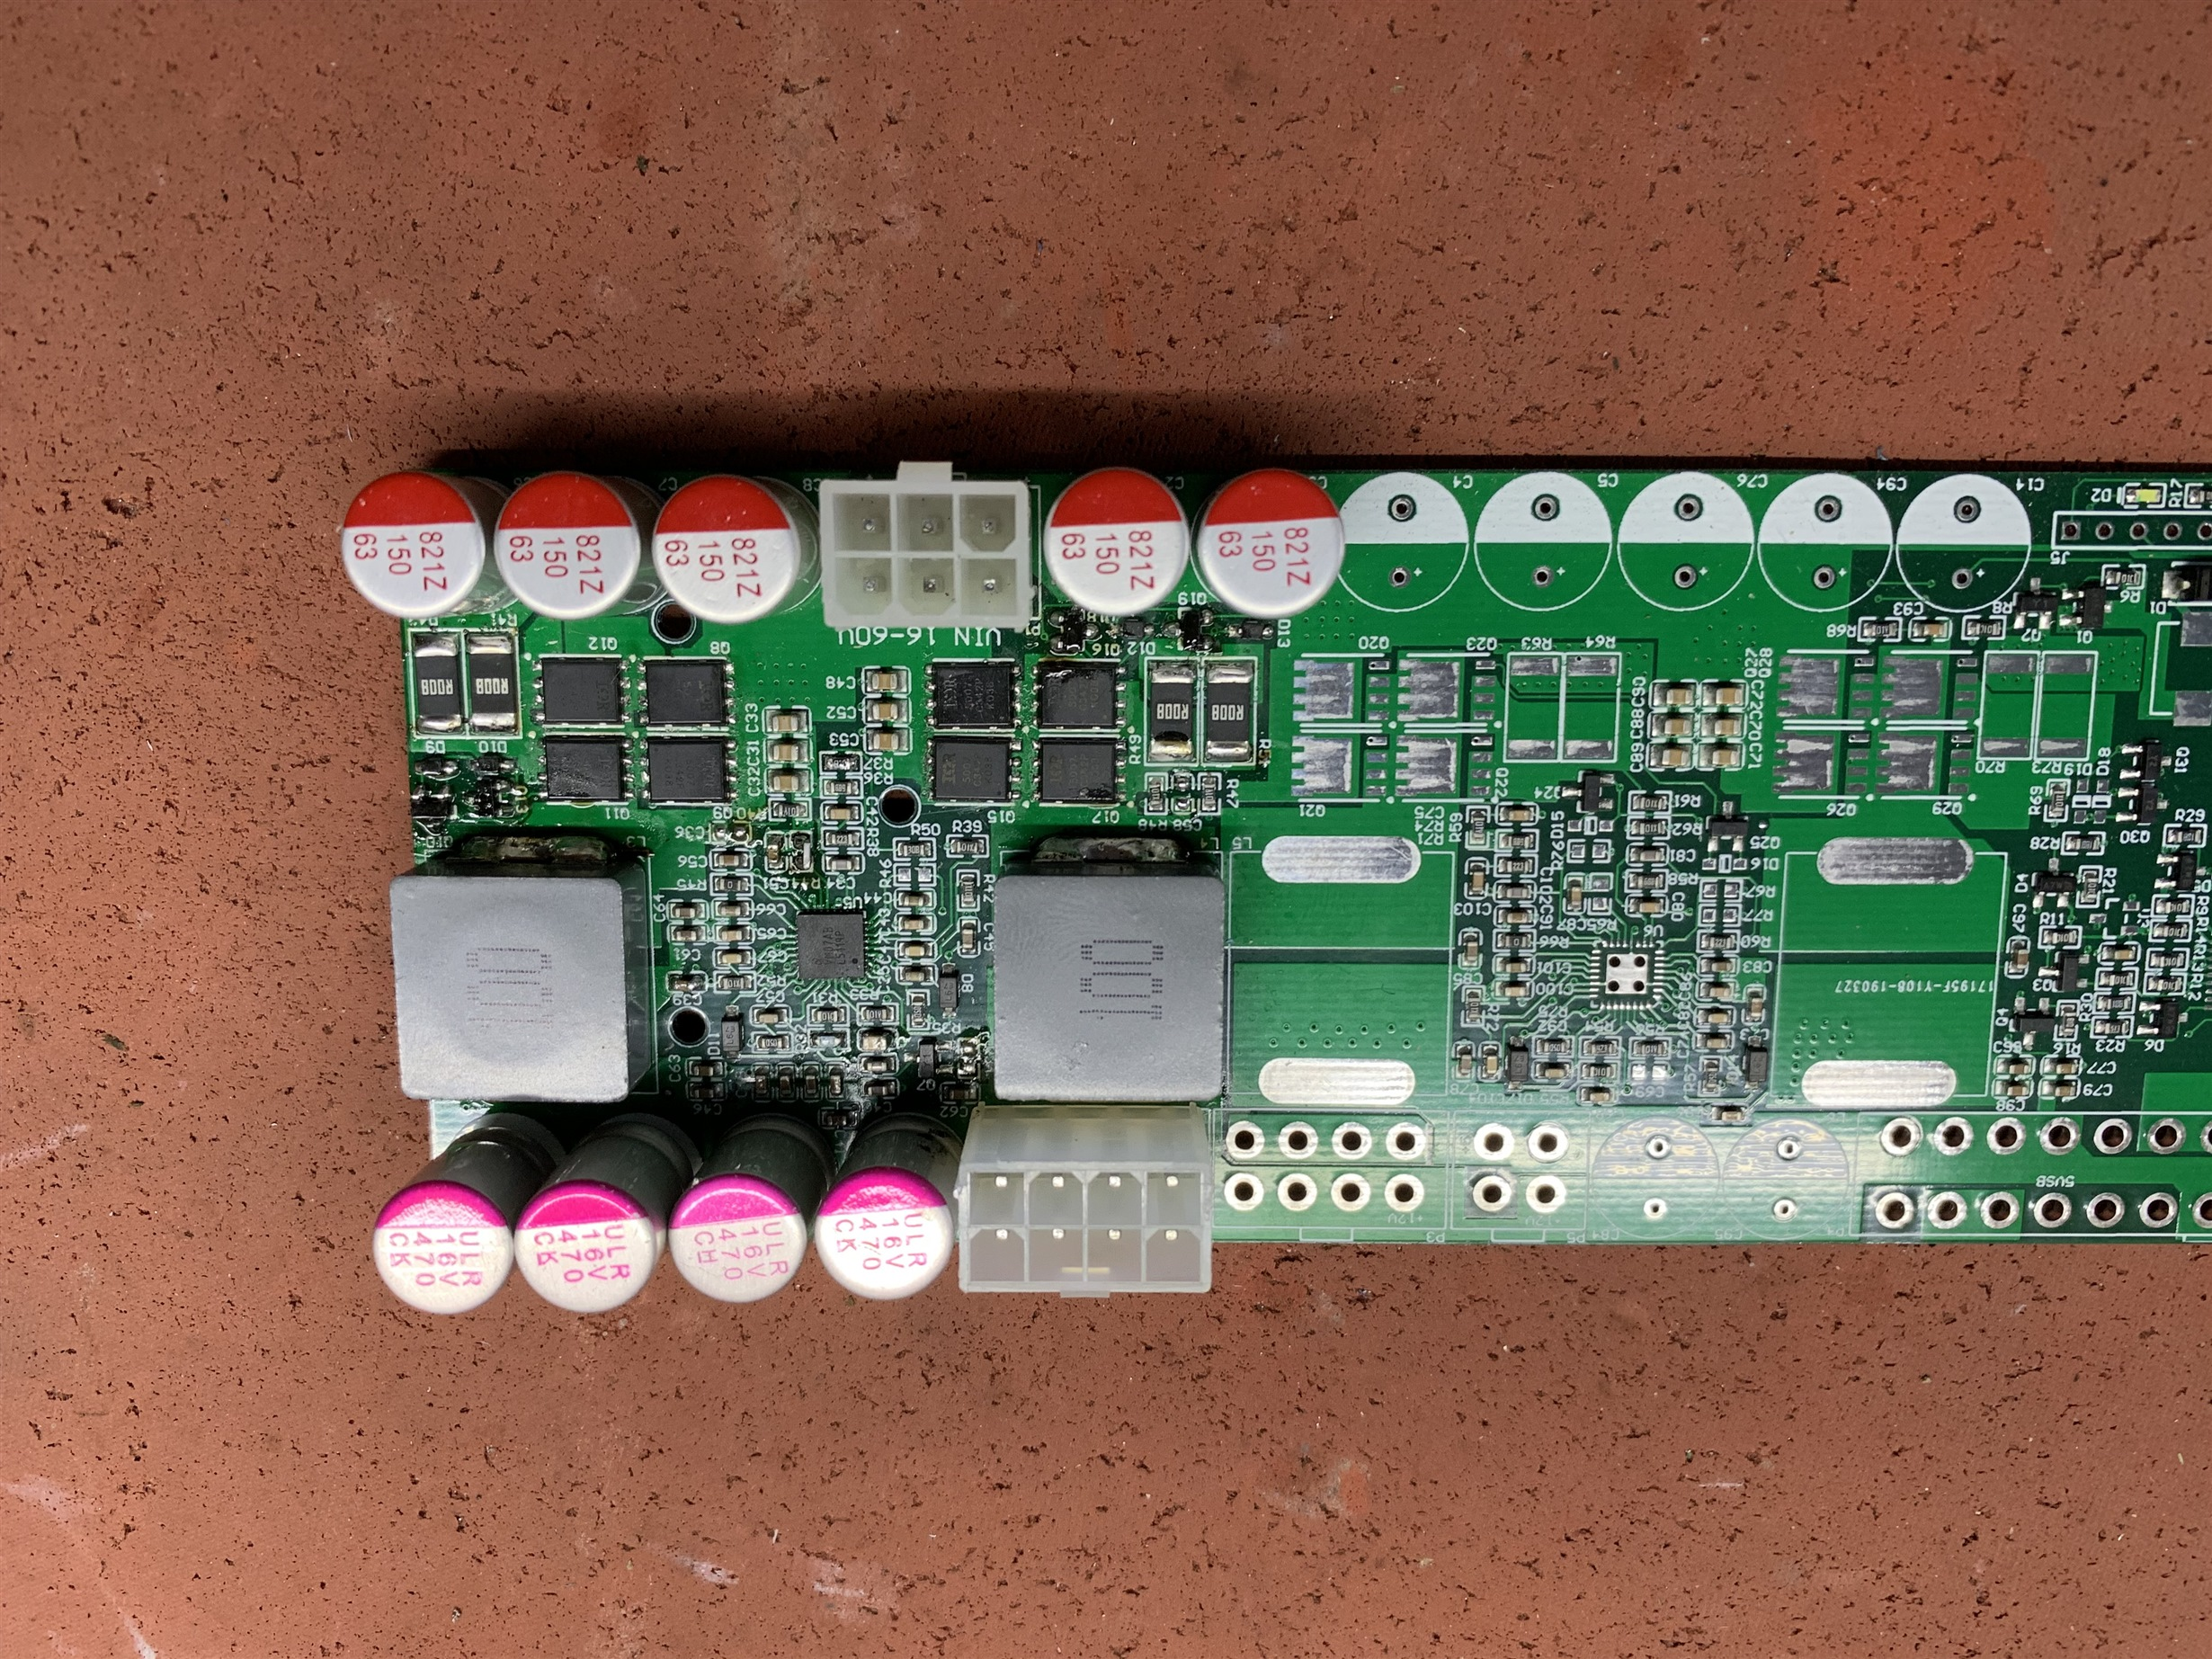 LM5119: 60V DC-DC Buck Controller Problem - Power management forum